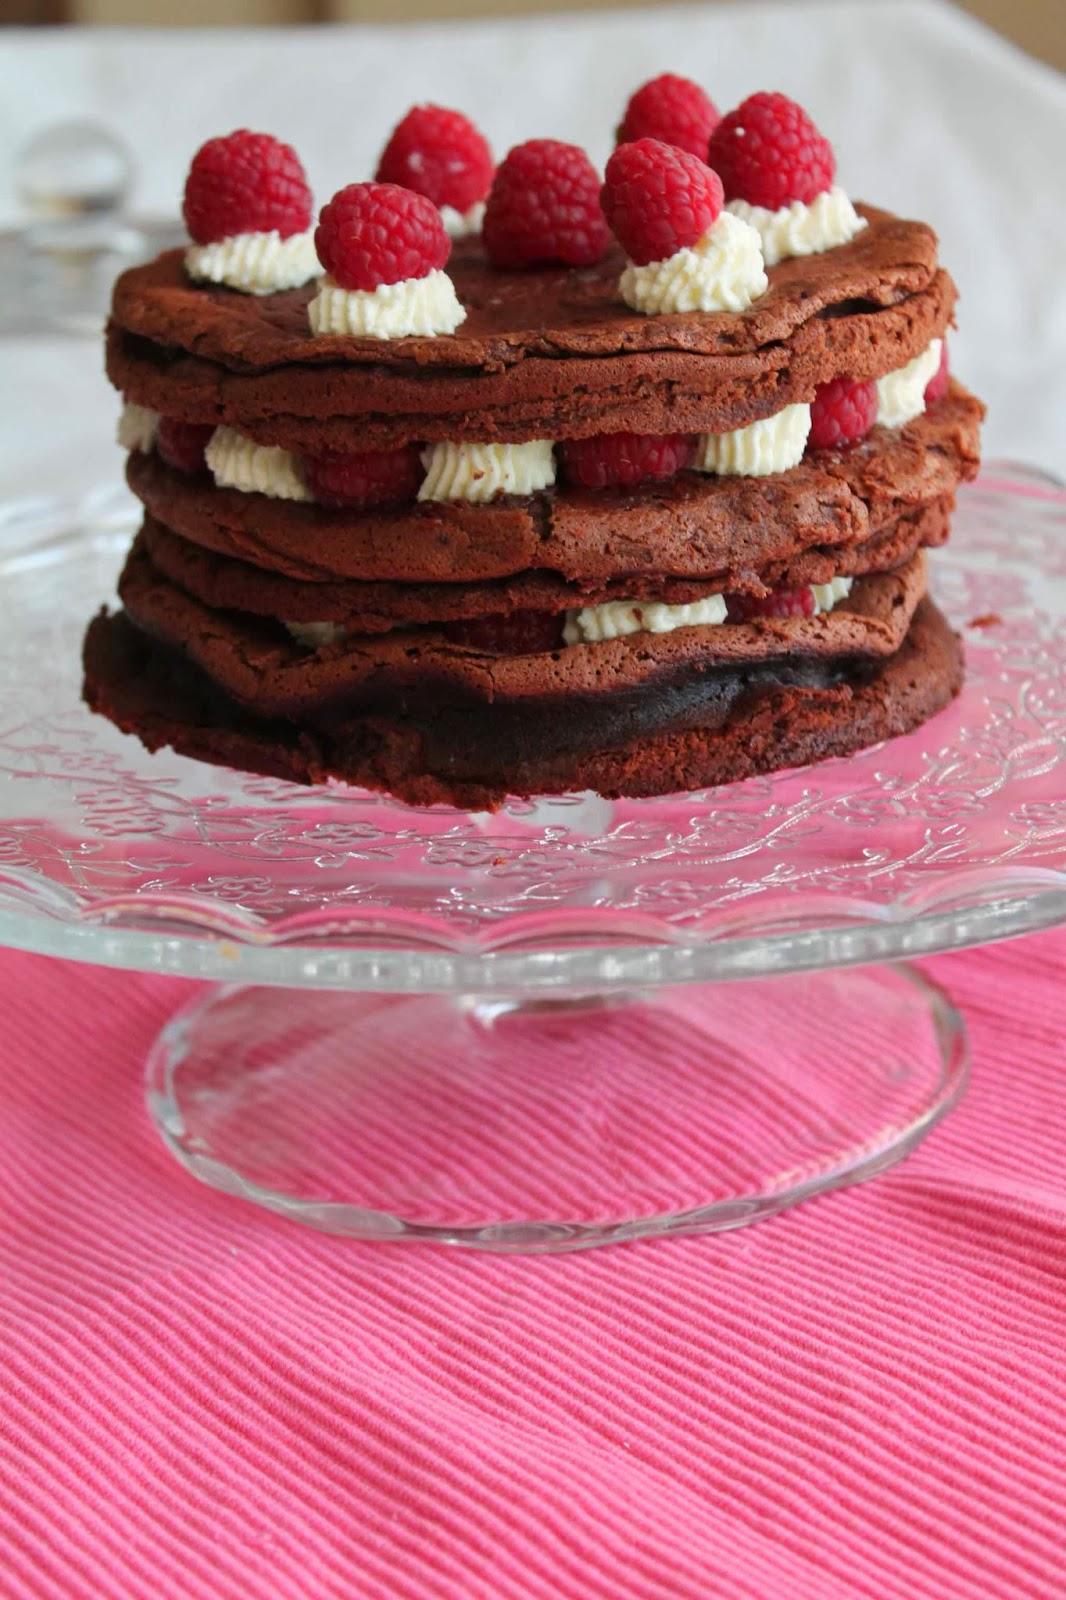 Tarta de chocolate con mousse de requesón y frambuesas